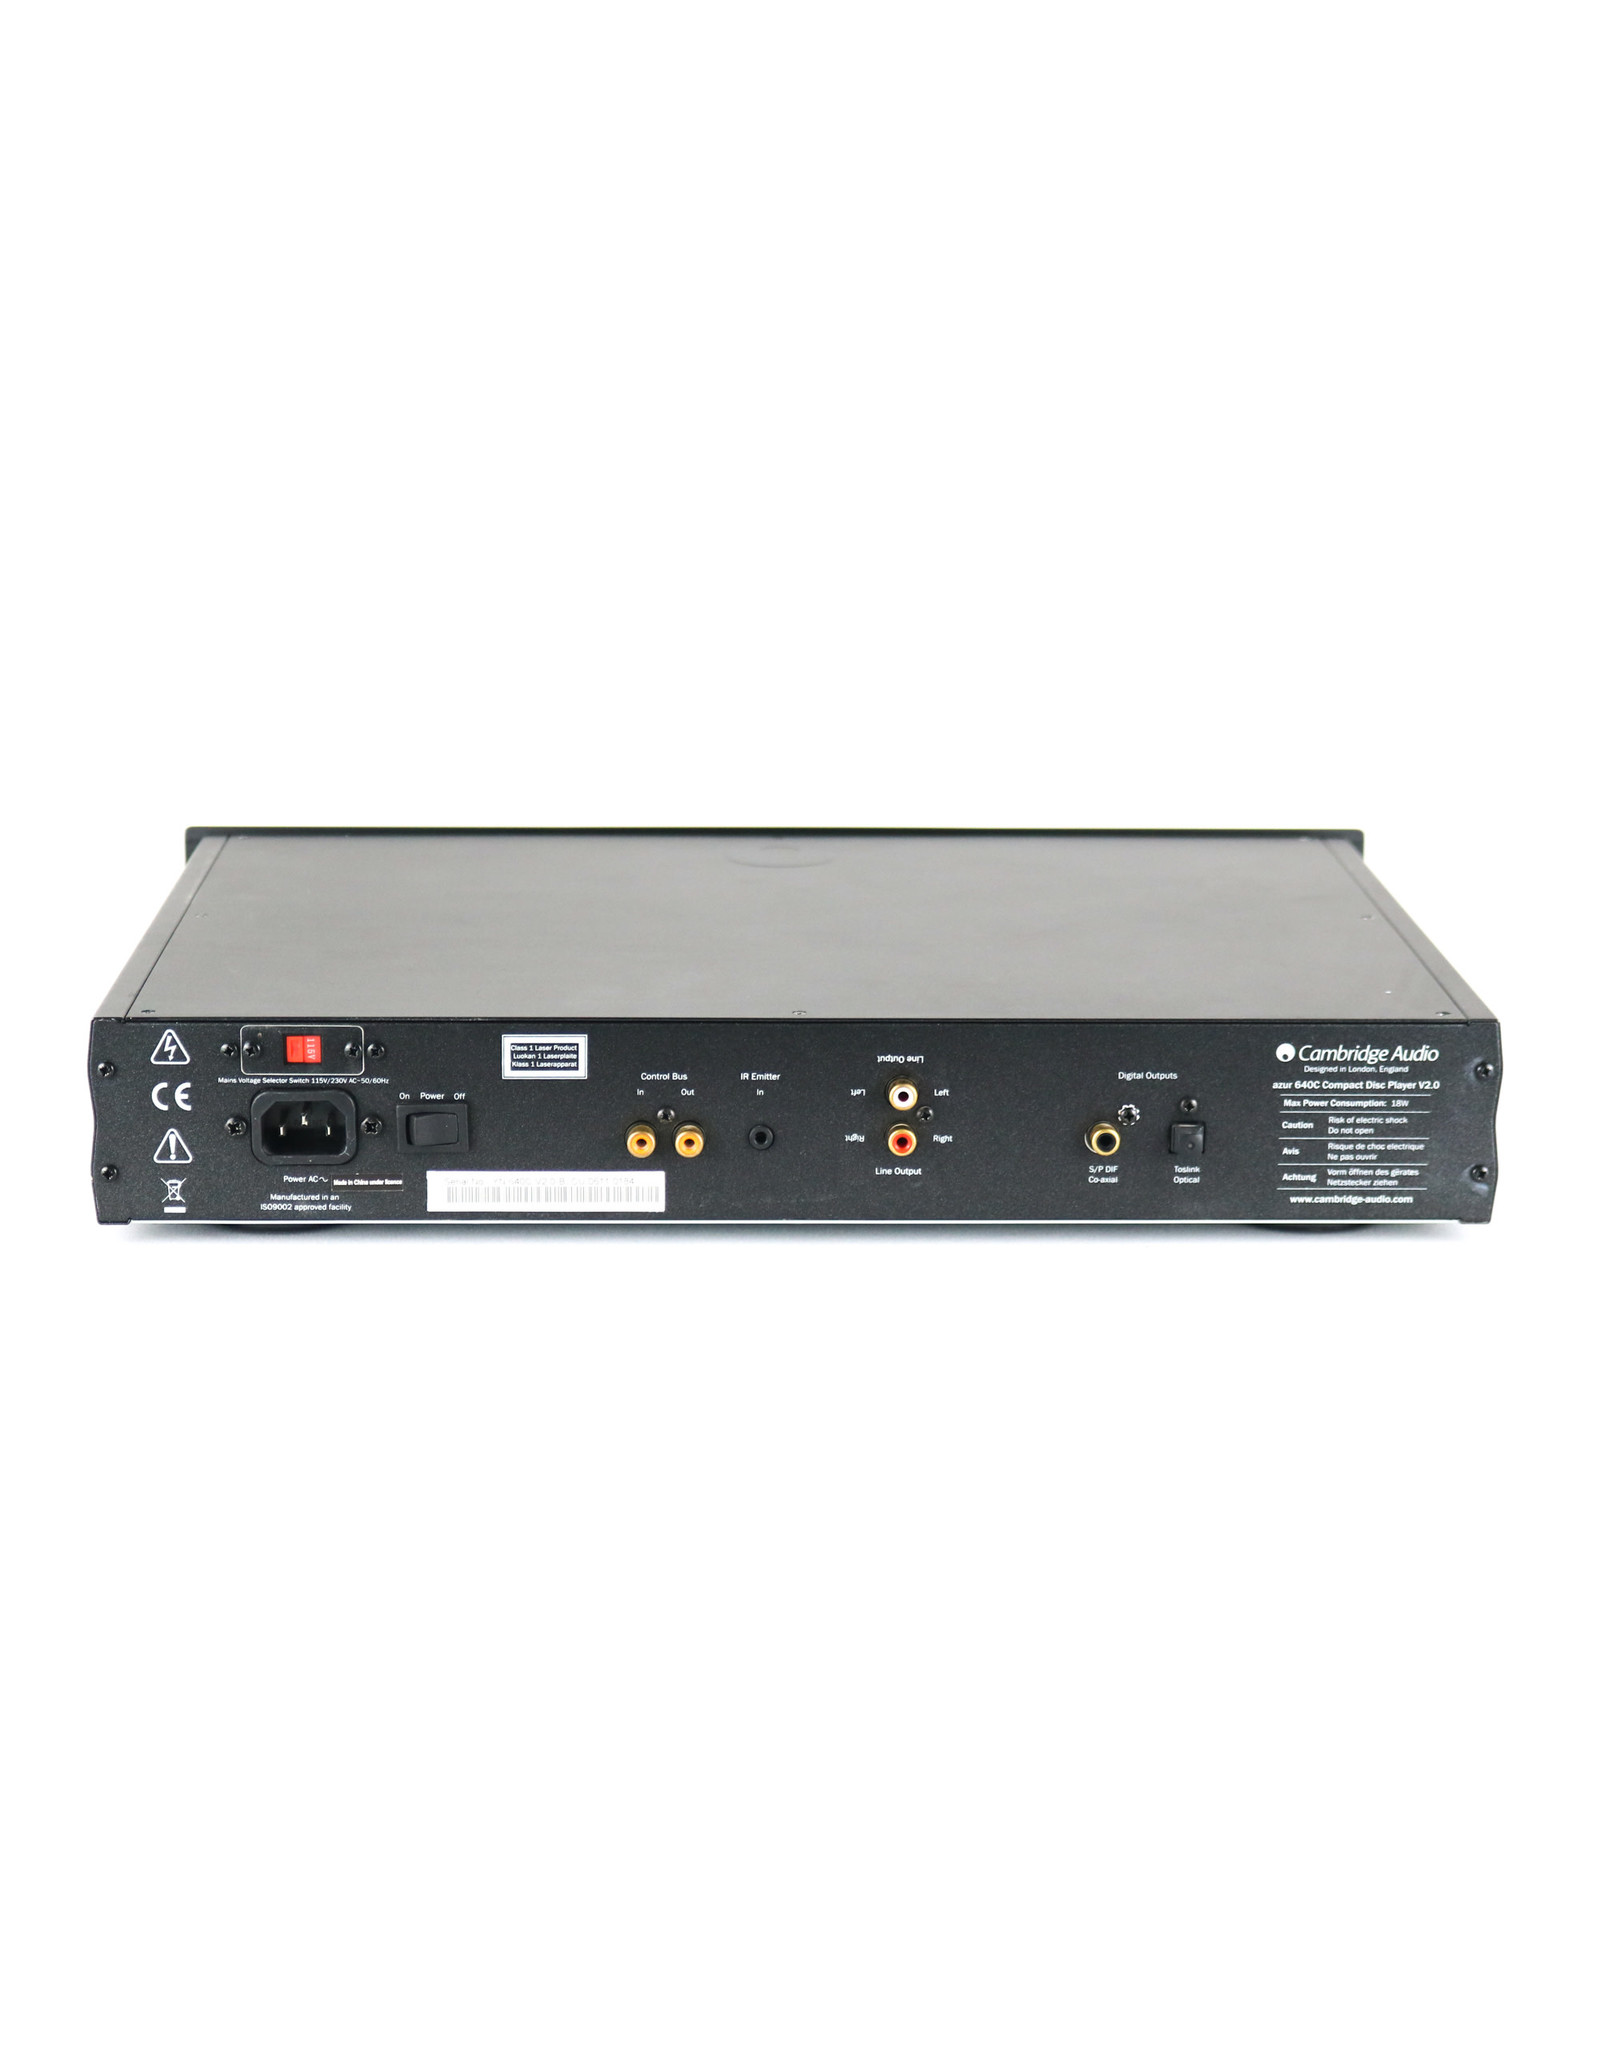 Cambridge Audio Cambridge Audio 640C V2 CD Player Black USED